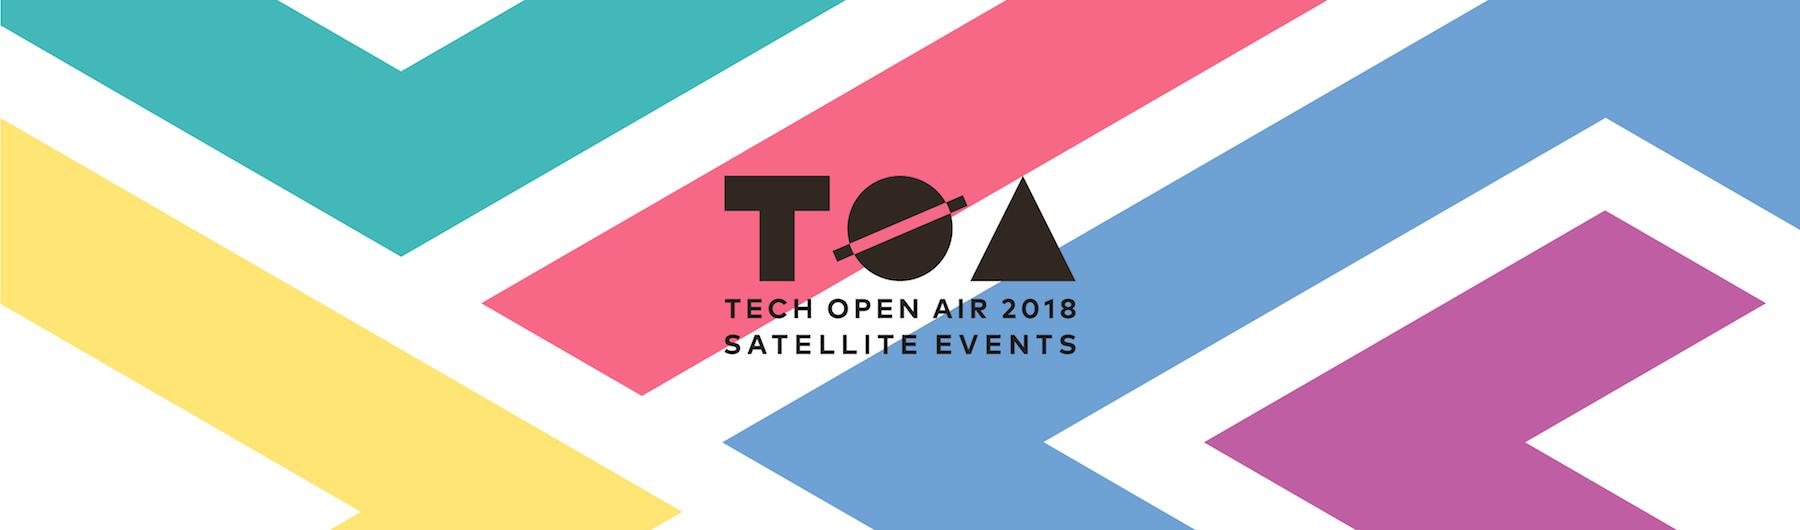 Travel Tech Tournament